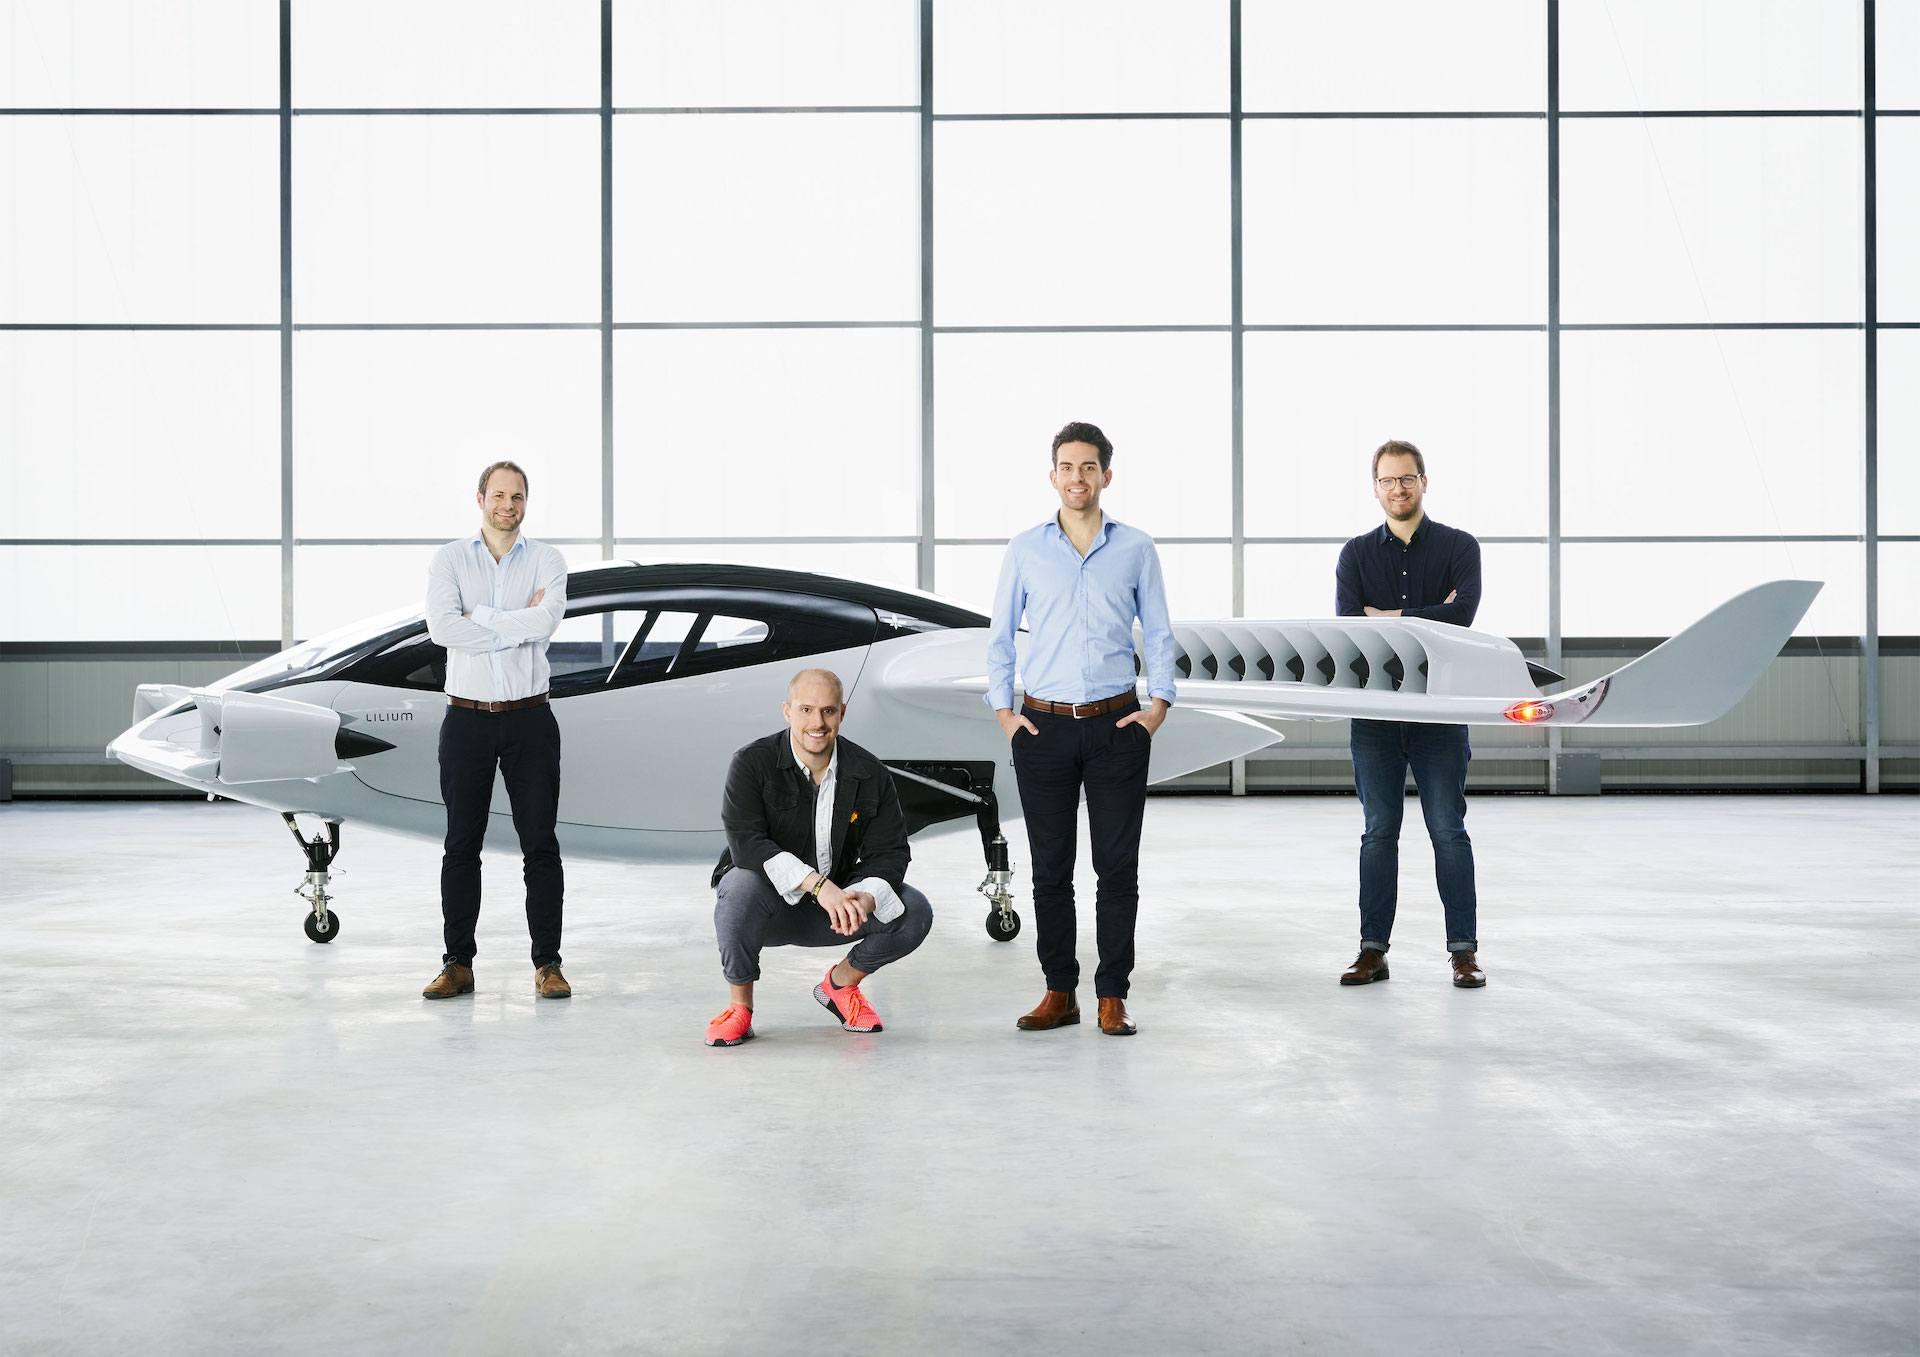 Zakladatelé Lilium Daniel Wiegand, Sebastian Born, Matthias Meiner a Patrick Nathen